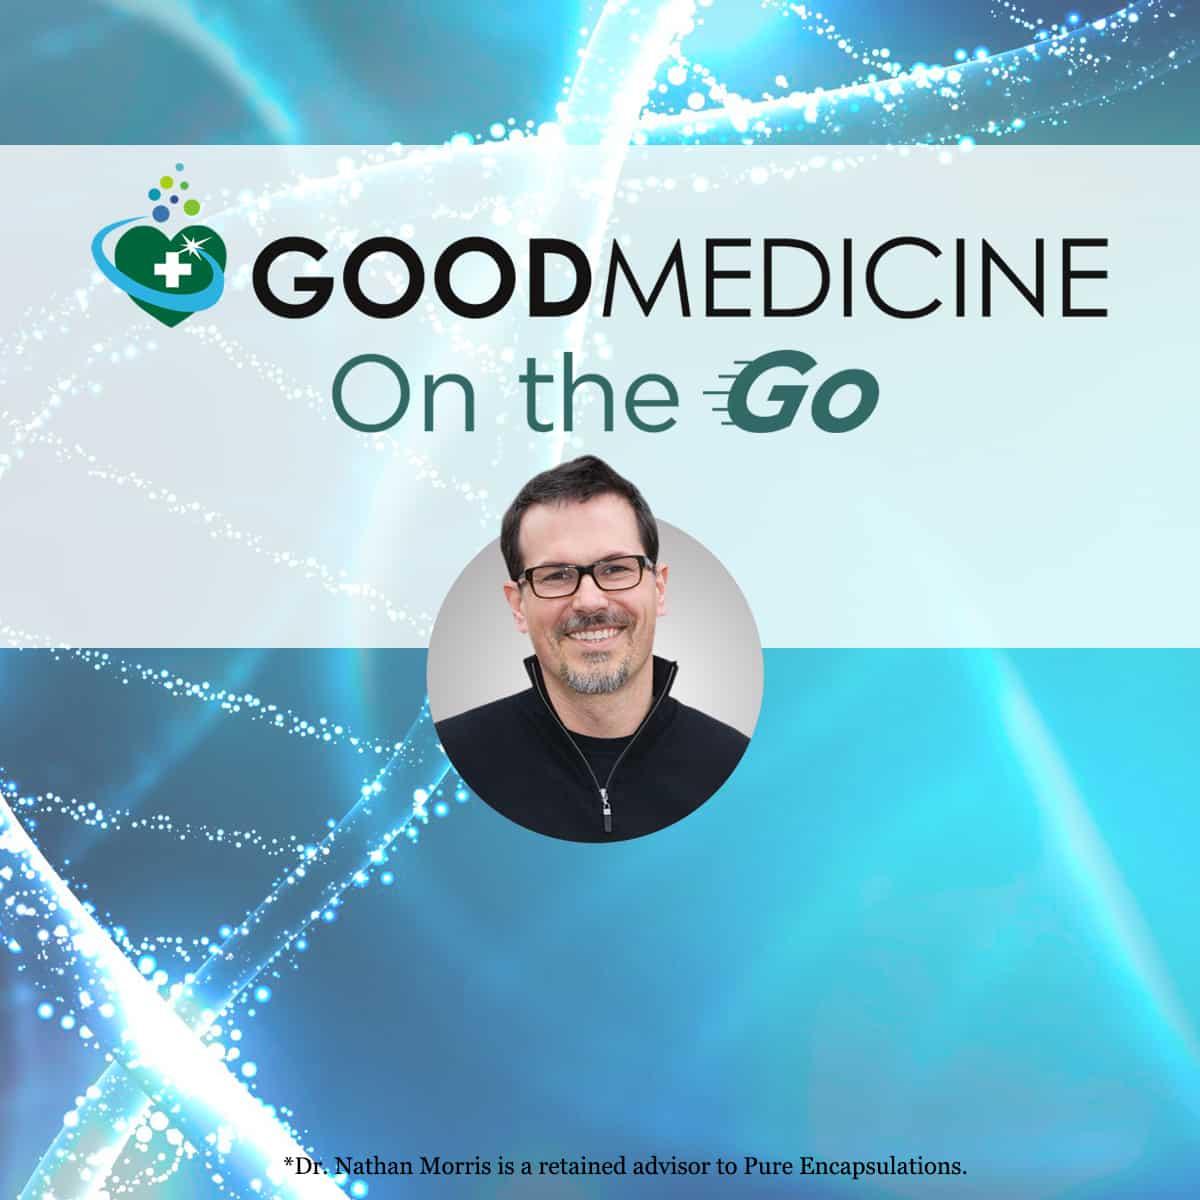 June Nutrigenomics Case Study Event with Dr. Nathan Morris